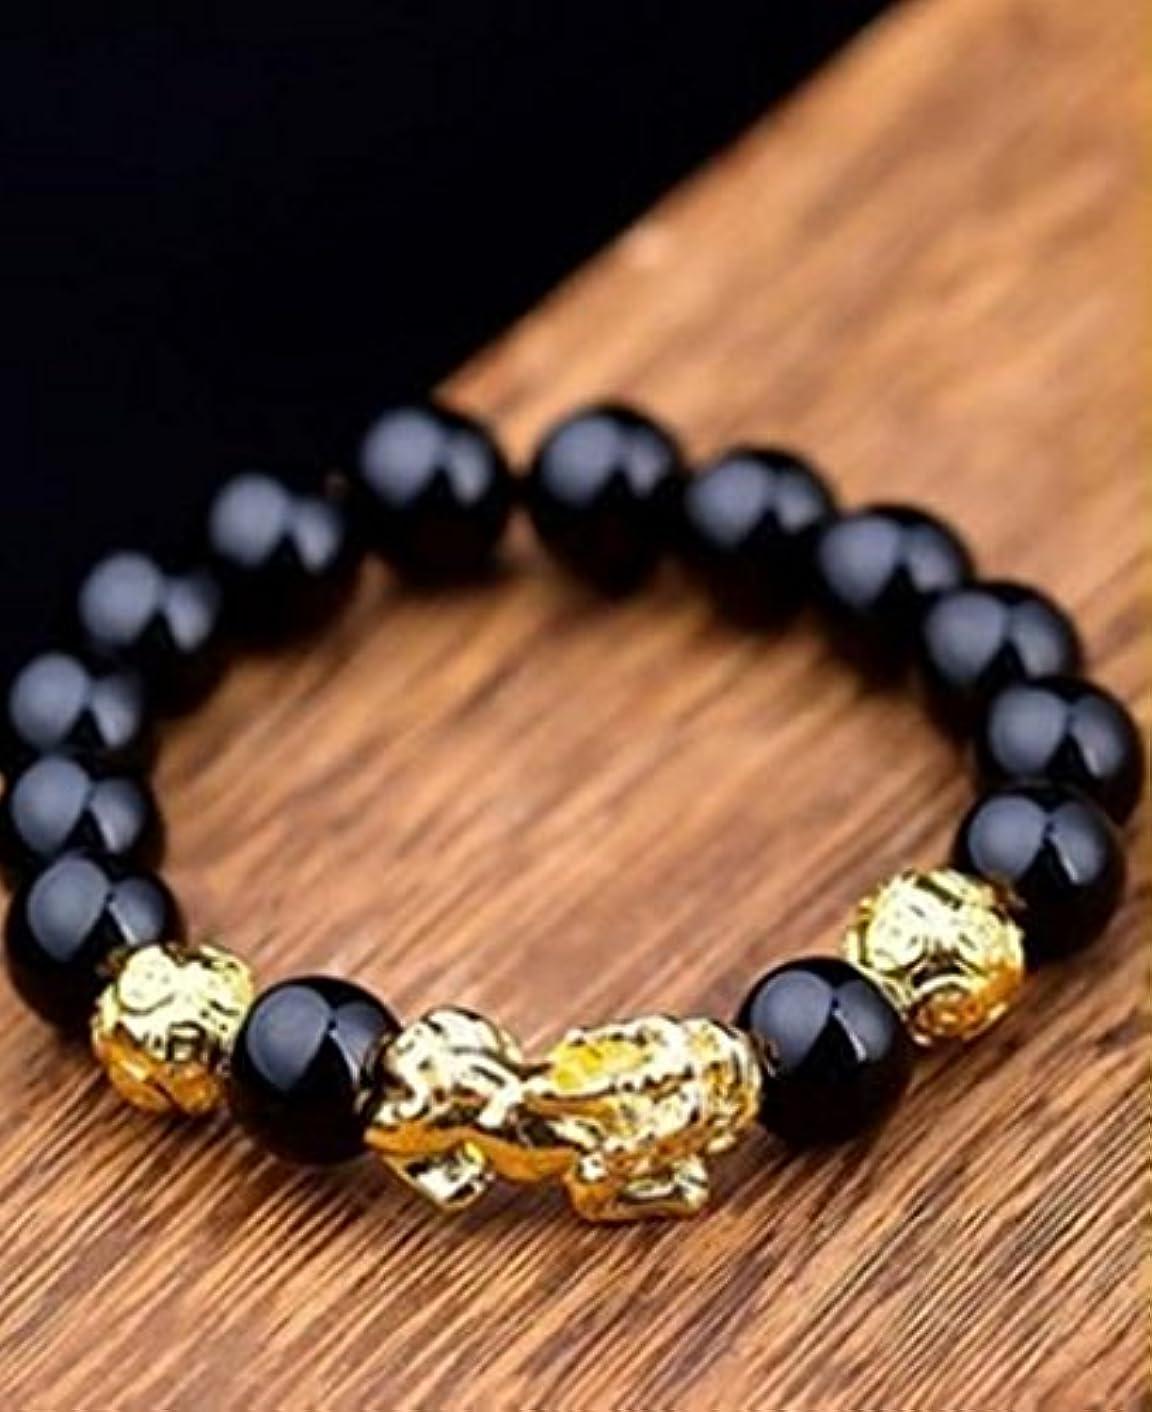 Generic Men's_ black bracelet bangle _Onyx_Gold_?_?_ women girls _Buddha_ bead hand _string_ jewelry bead jewelry bead jewelry _lovers_ hand gift